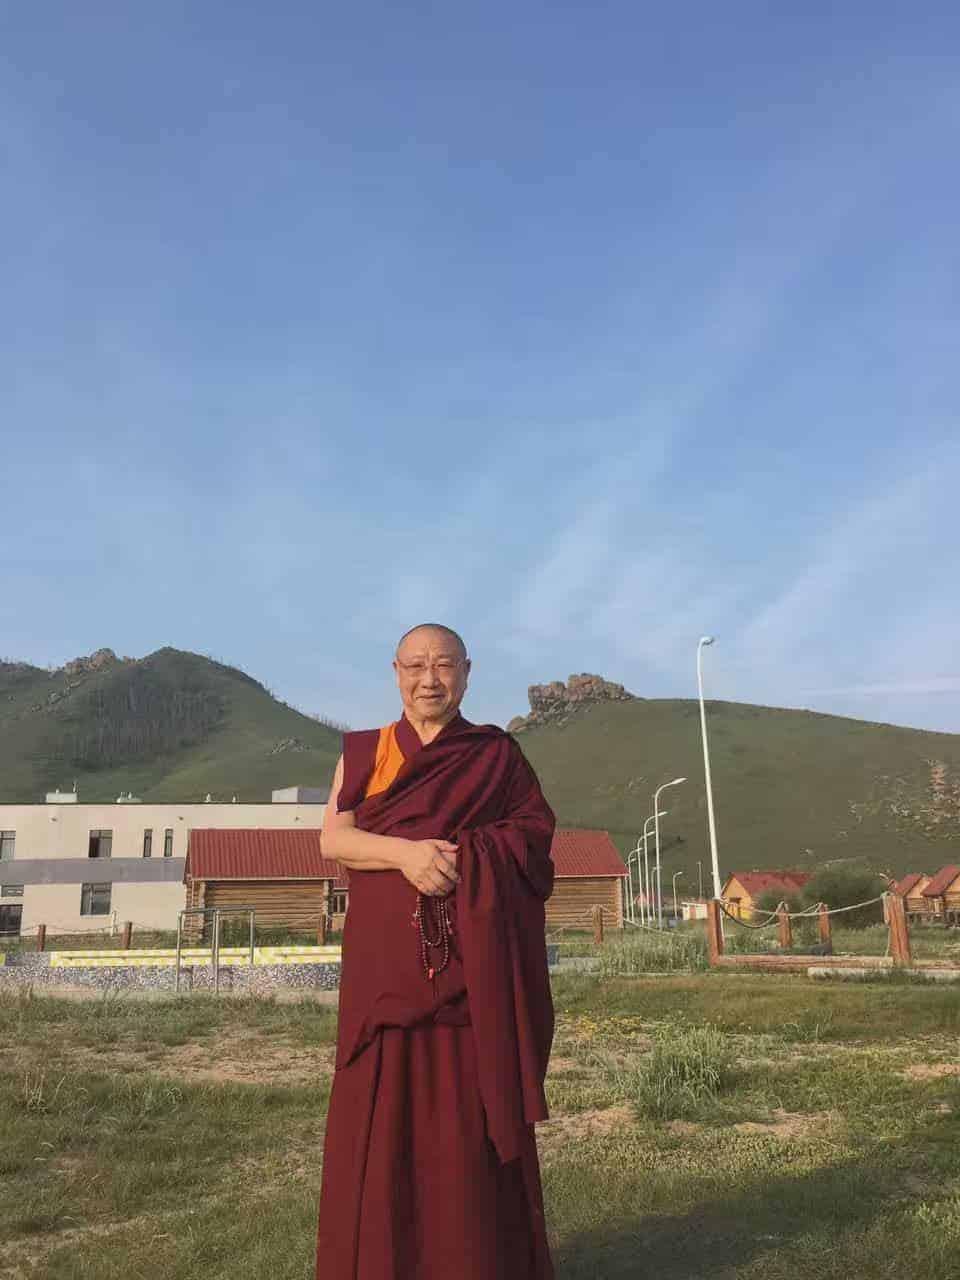 gosok-rinpoche-mongolia-2016-9ad67d7dd9541dd7f35f5fcc195b77d